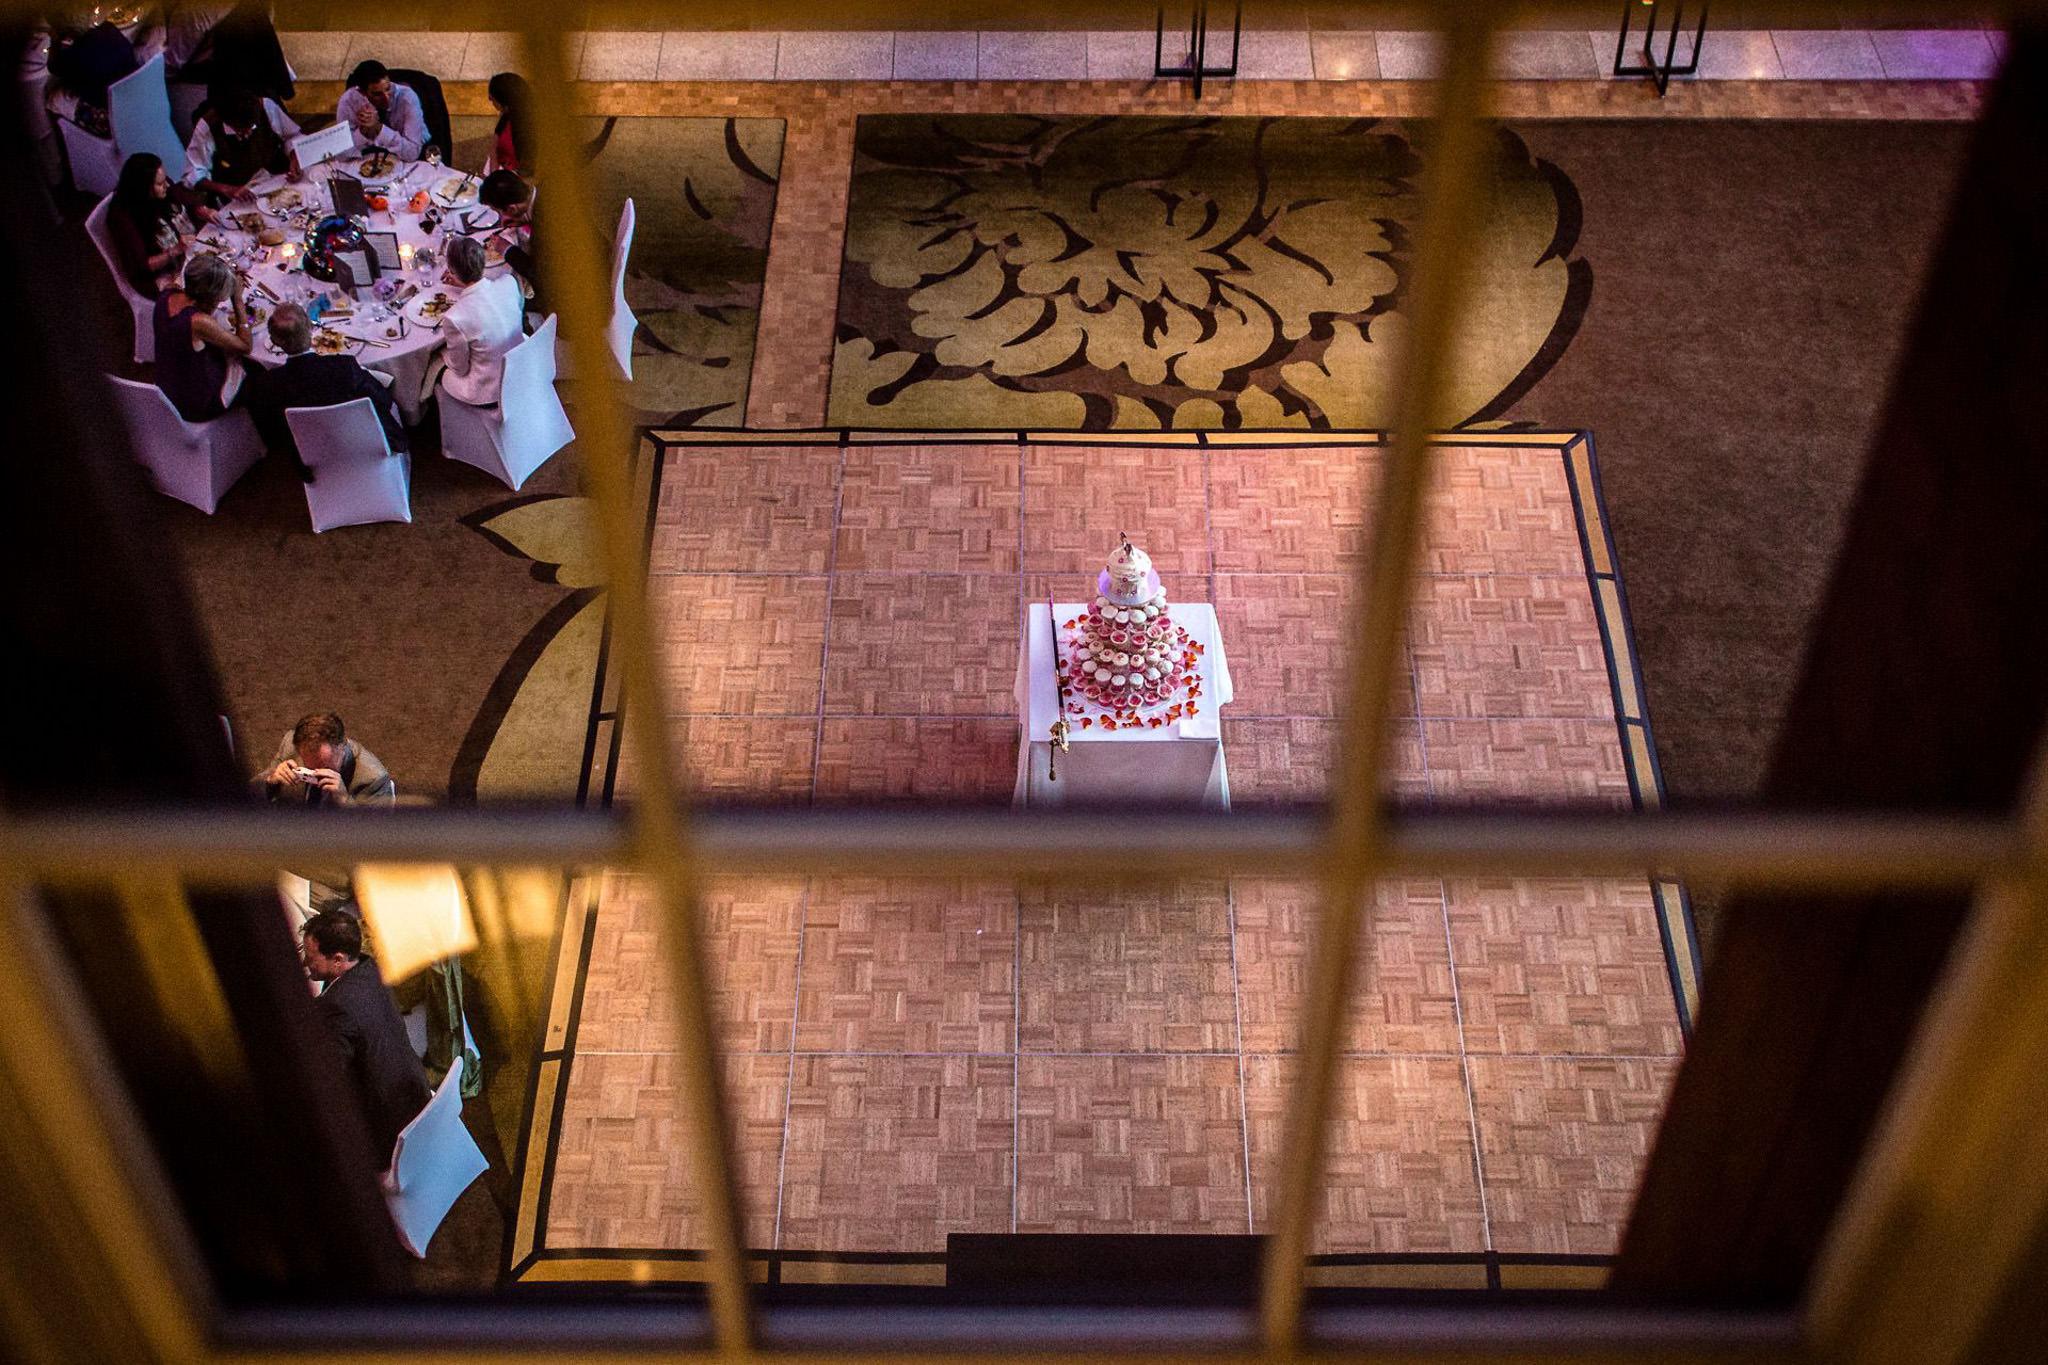 St. Pancras hotel wedding the cake